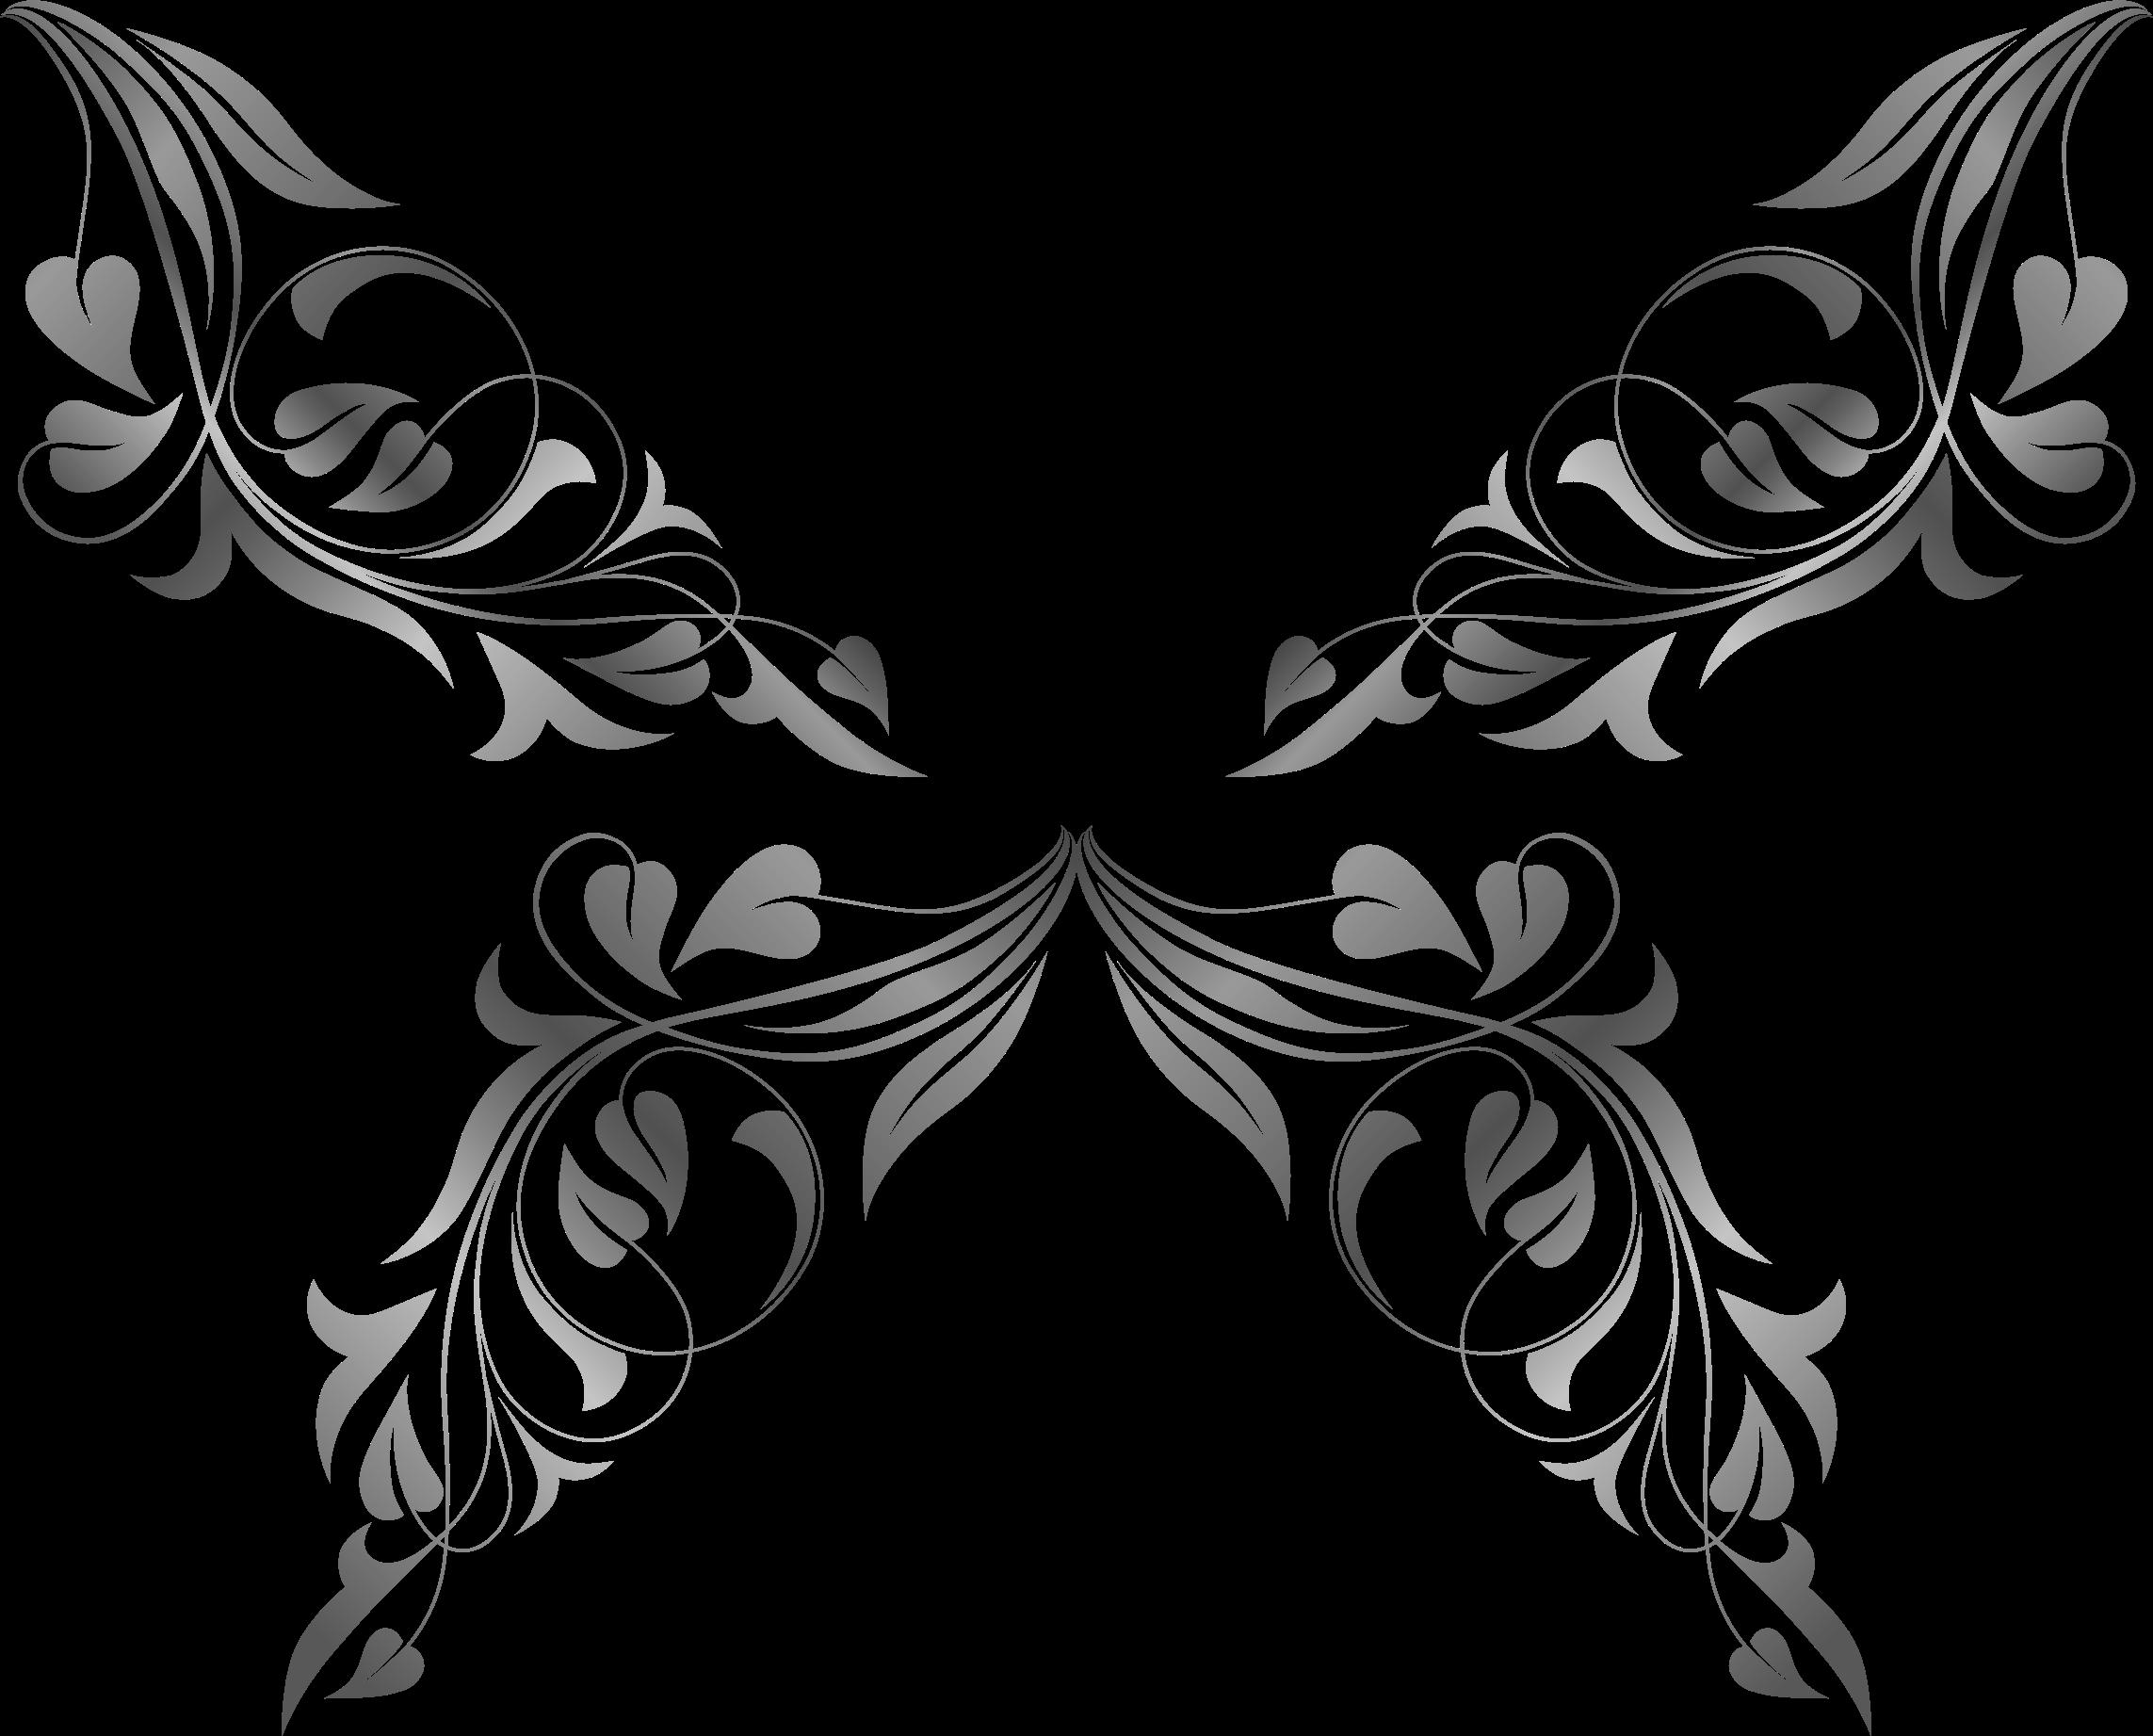 Butterflies clipartblack com animal. Flourish clipart butterfly